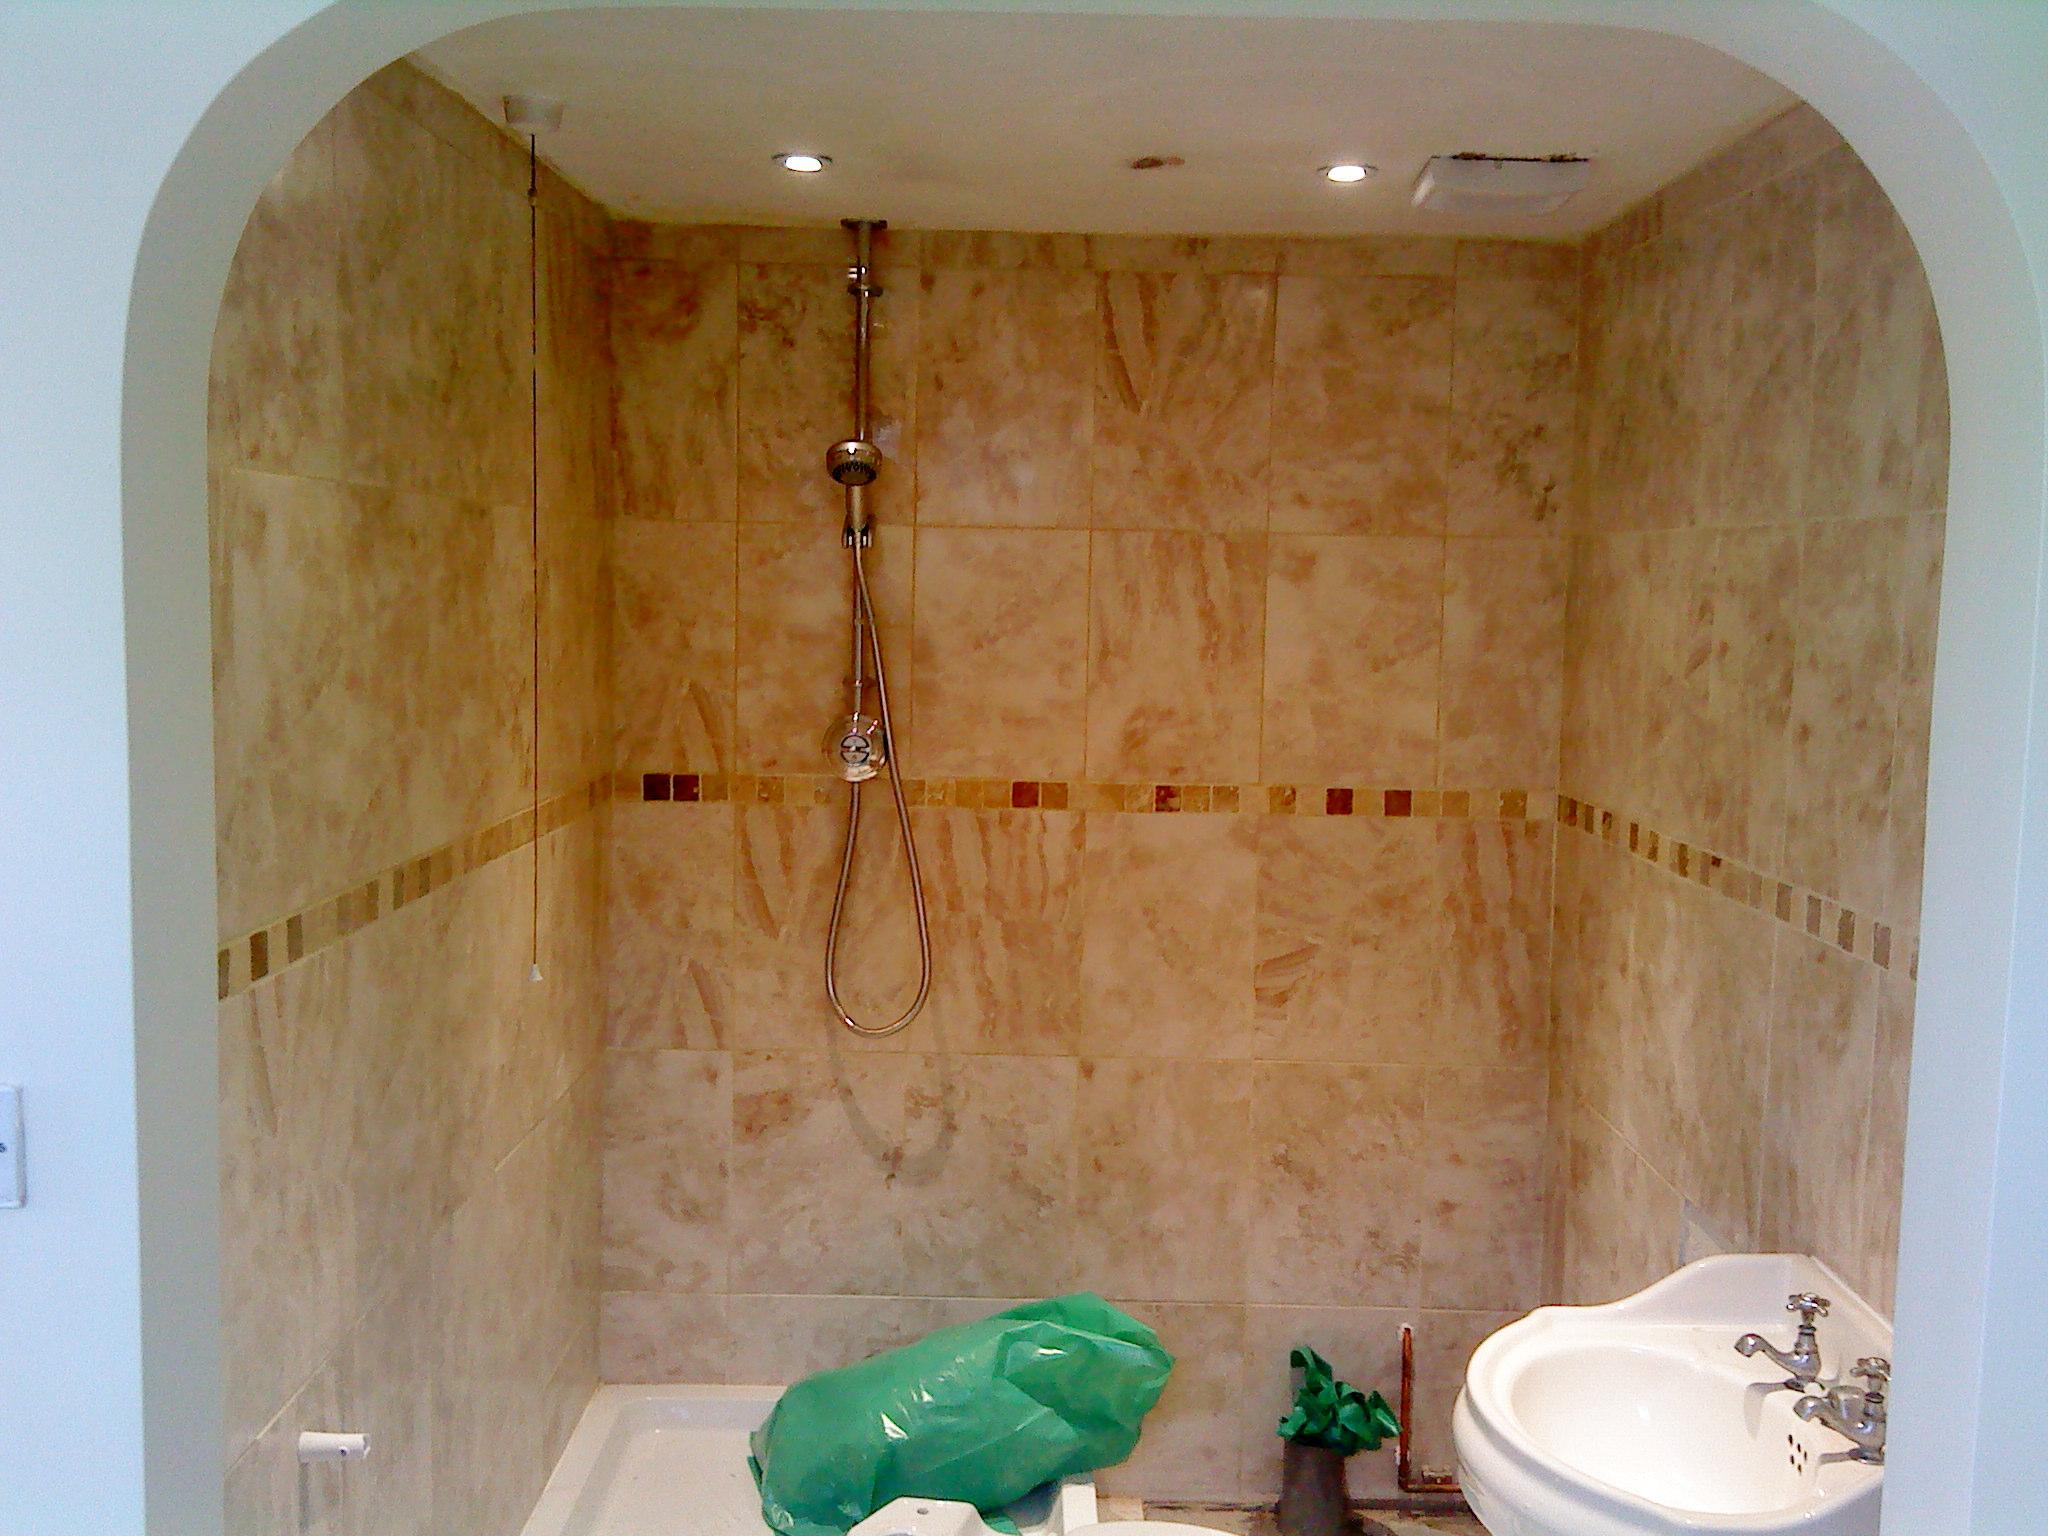 Wall and floor tiling jobs